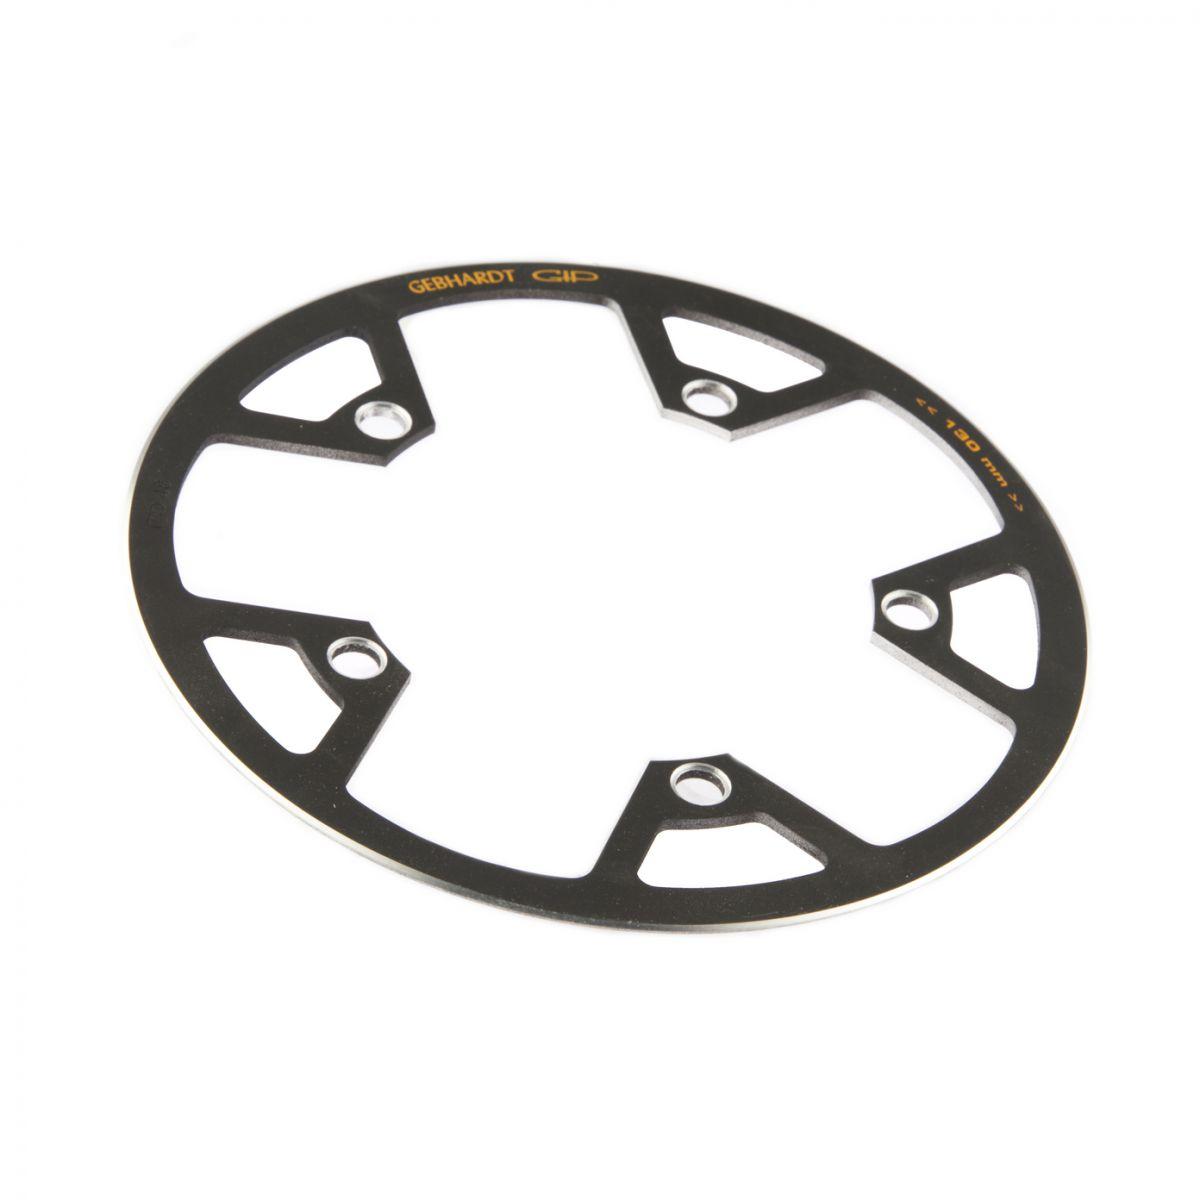 gebhardt kettingbladring rock ring classic bcd 130mm 5gats 52t zwart